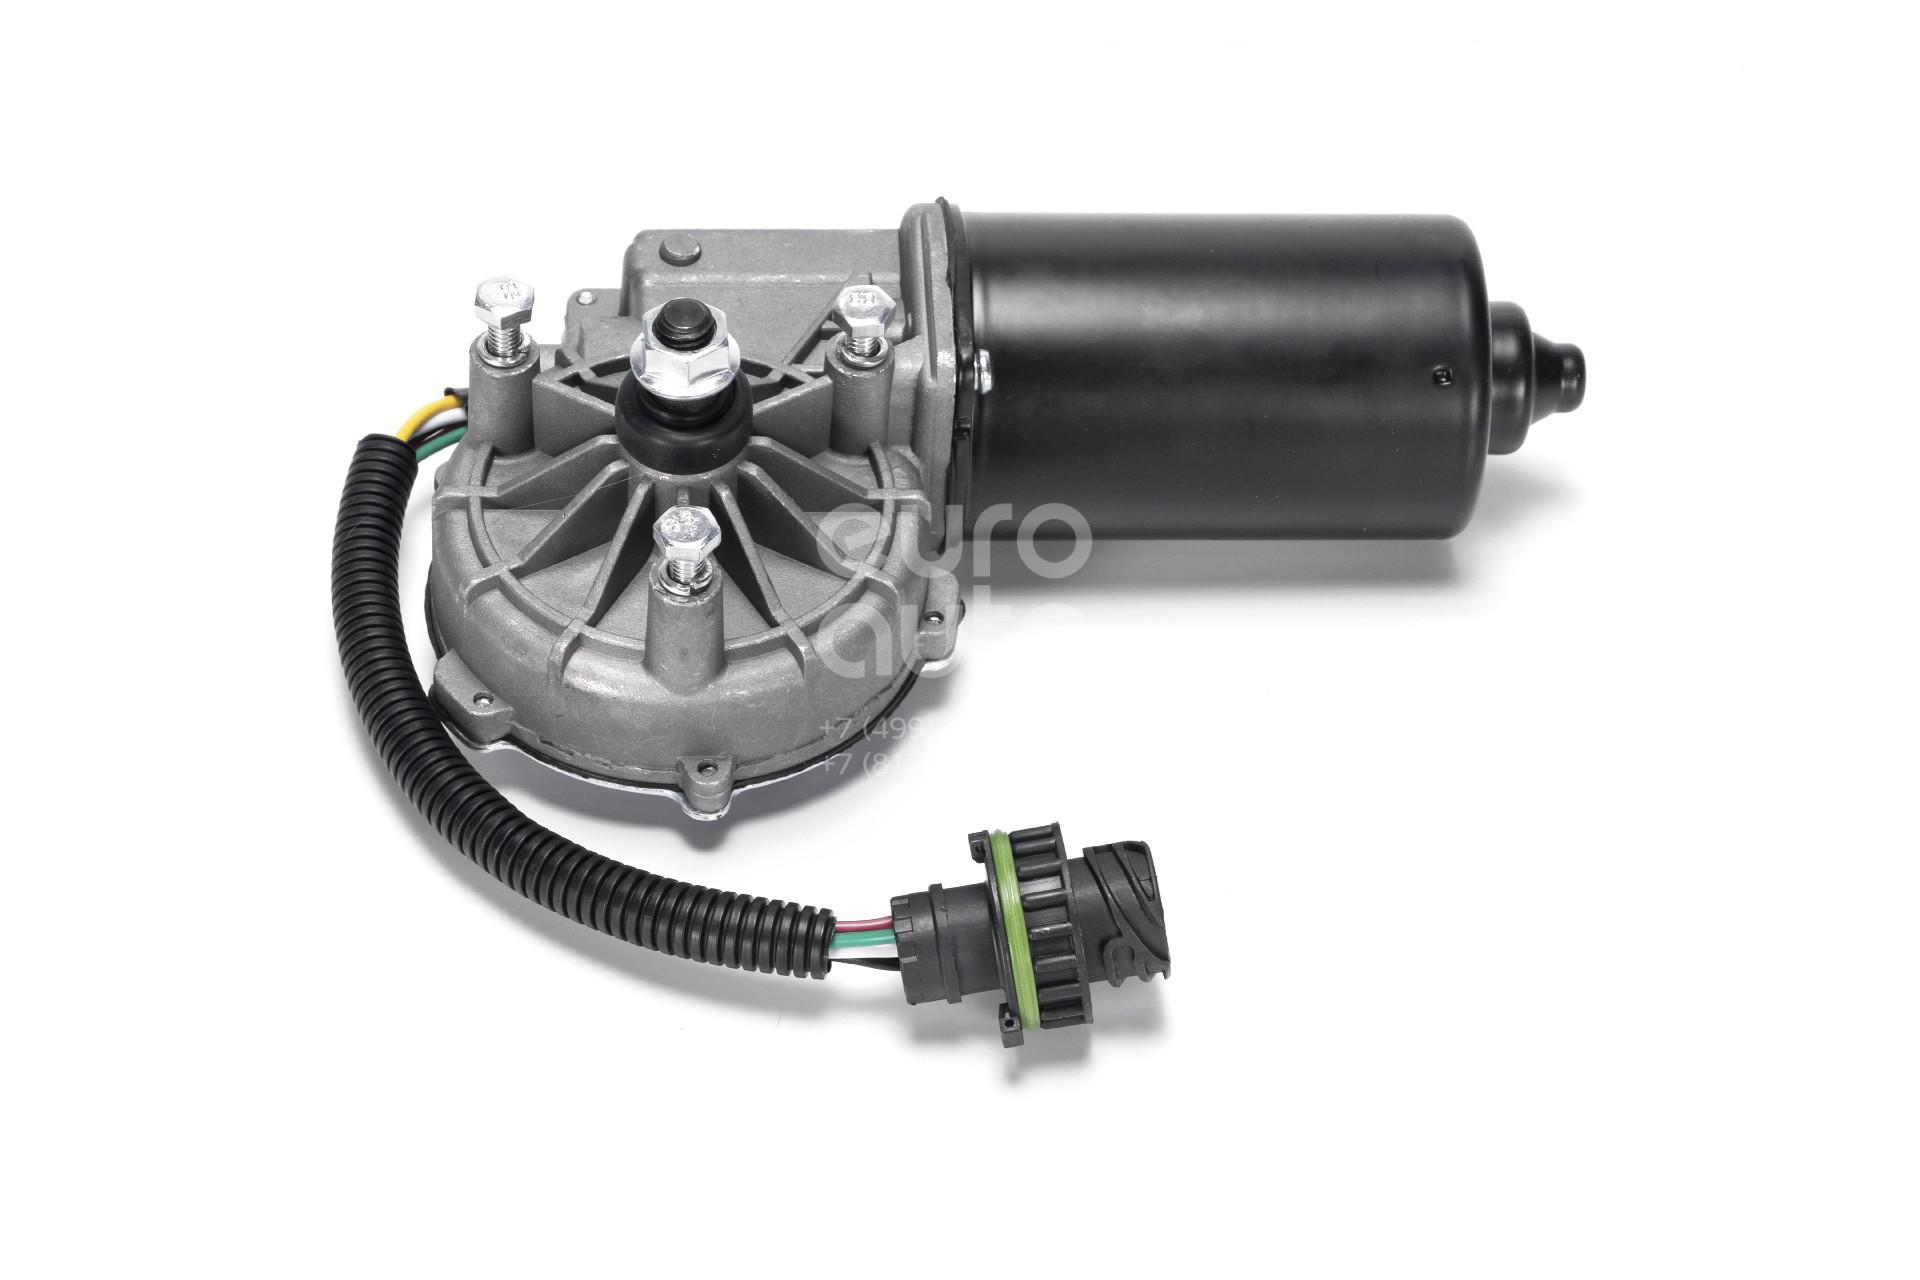 Купить Моторчик стеклоочистителя передний Volvo TRUCK FH12 2000-2008; (T0516-7003)